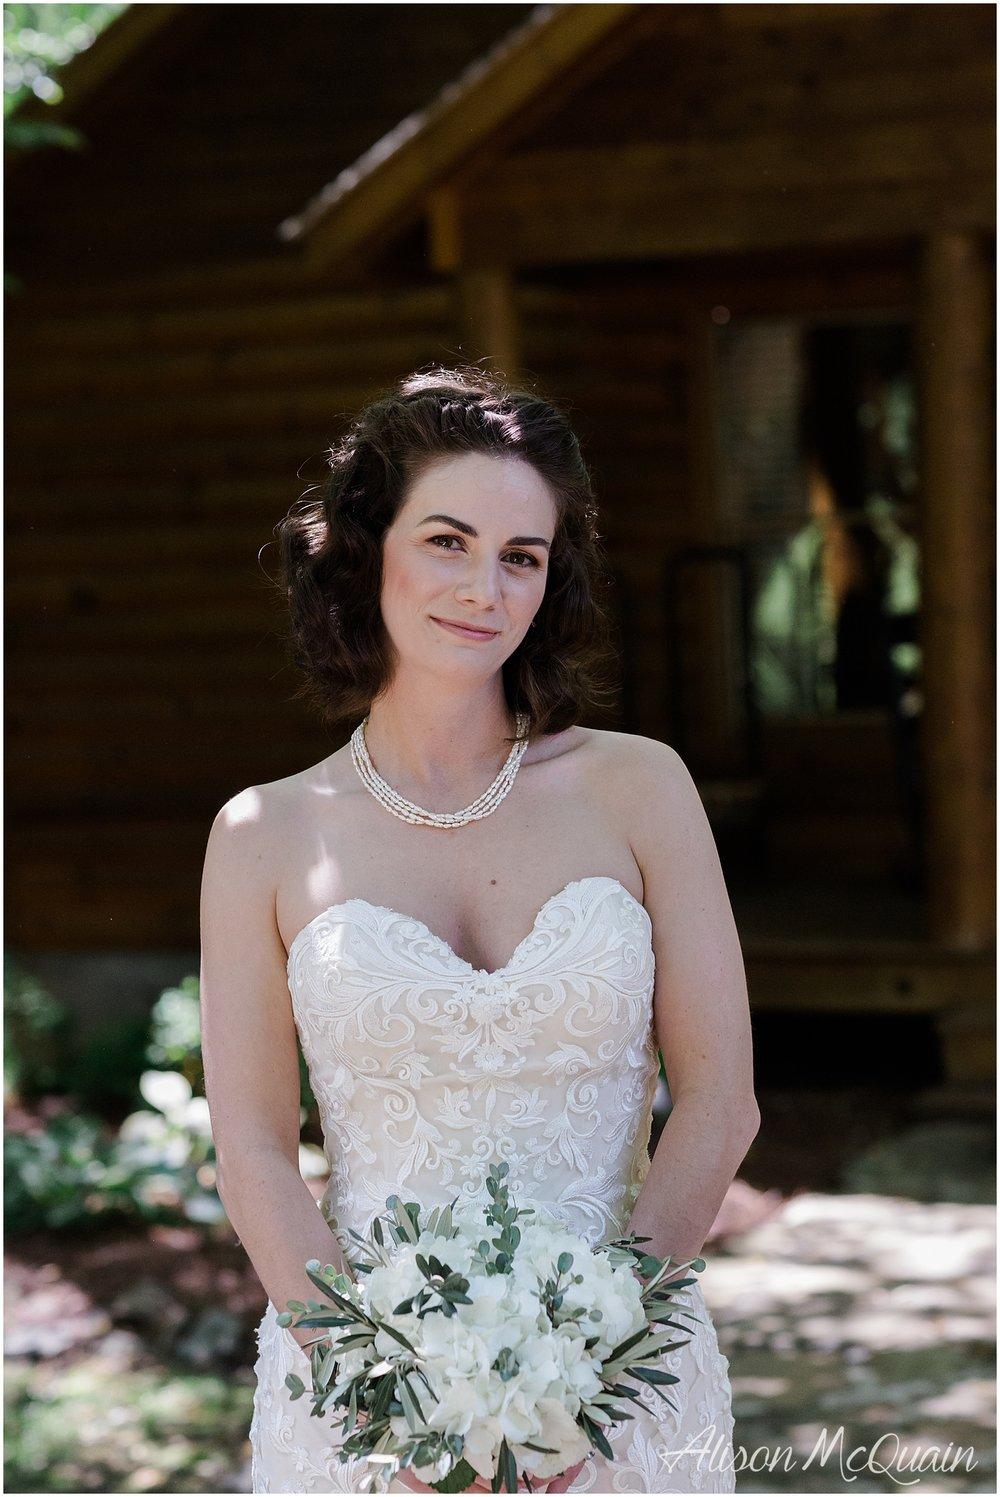 2018-05-23_0005LandC_wedding_dancingbearlodge_townsend_tn_amp.jpg